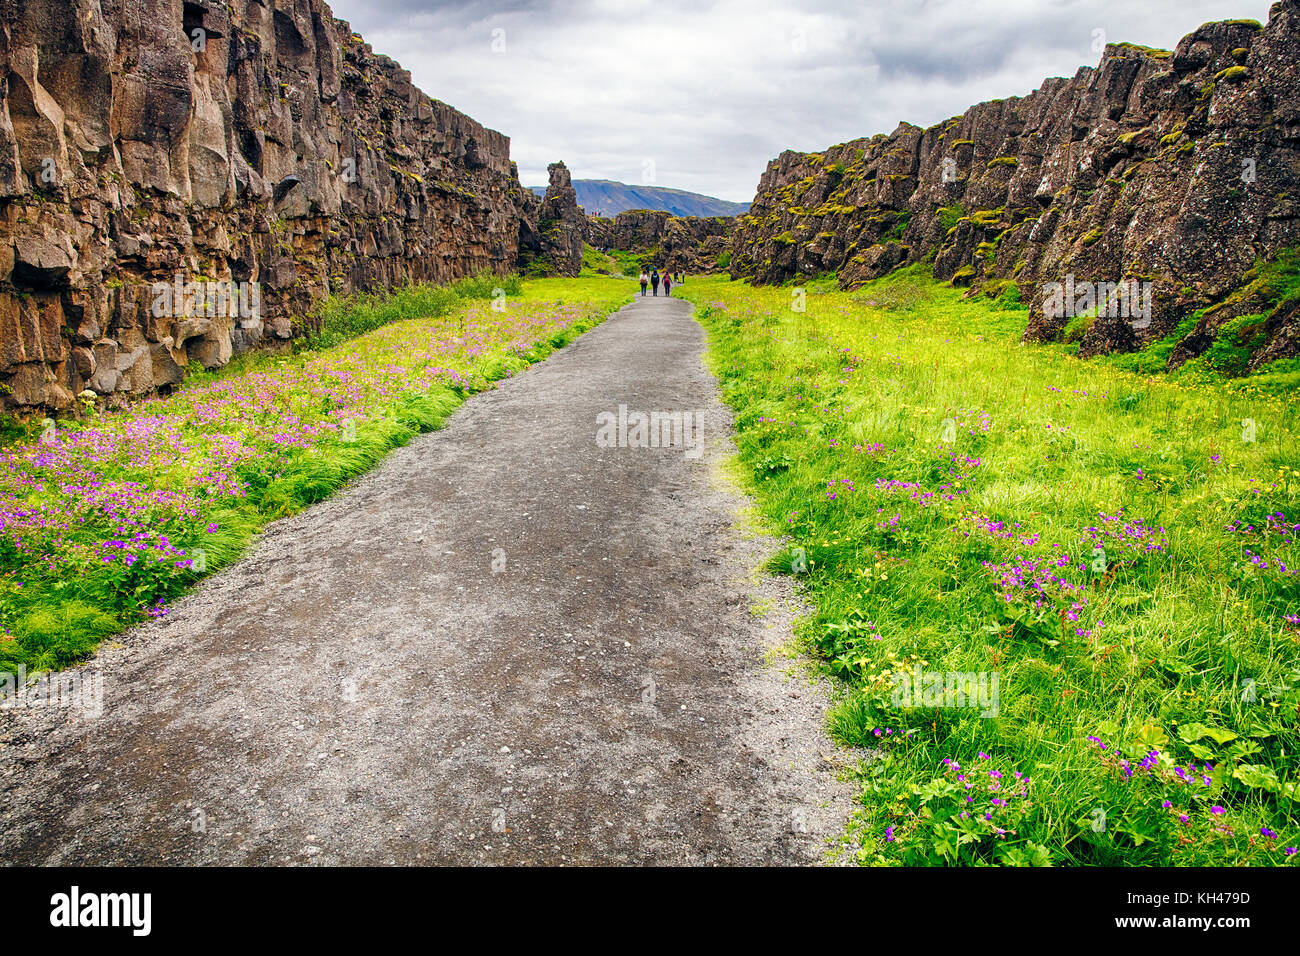 Walking Trail in a Thingvellir National Park, Iceland, Europe - Stock Image